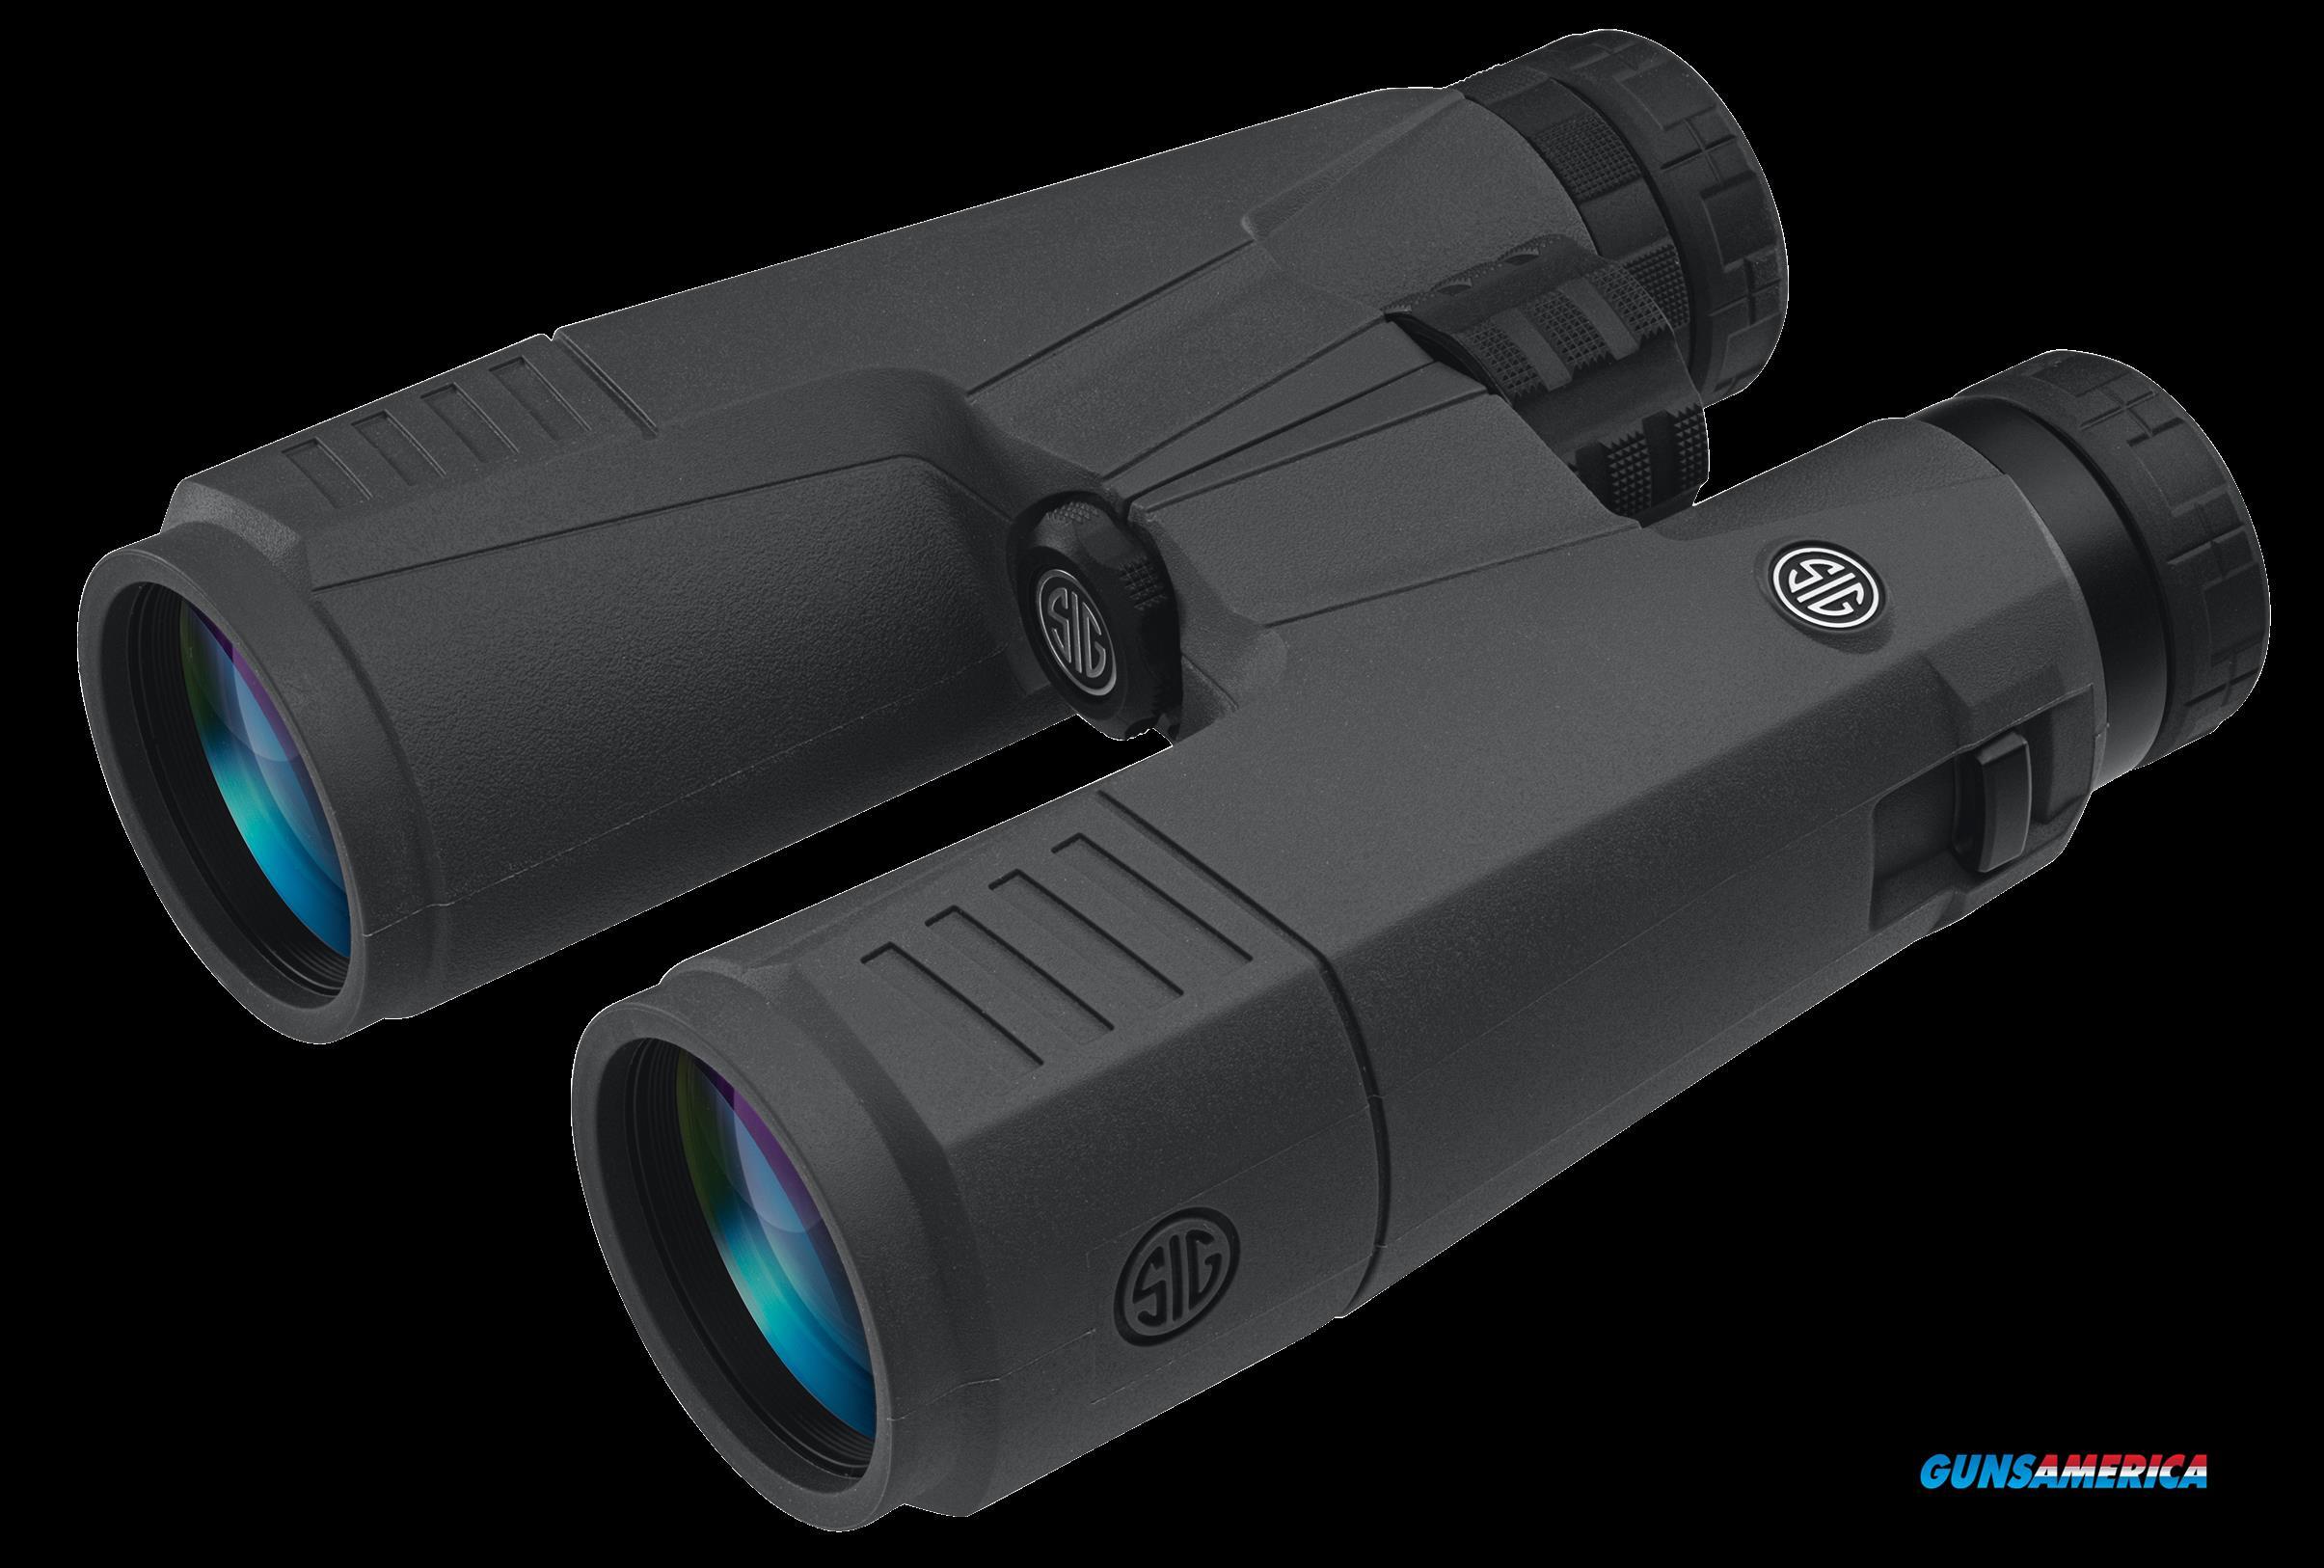 Sig Sauer Electro-optics Zulu9, Sig Soz99003  Zulu9  Close Bridge 15x56  Guns > Pistols > 1911 Pistol Copies (non-Colt)